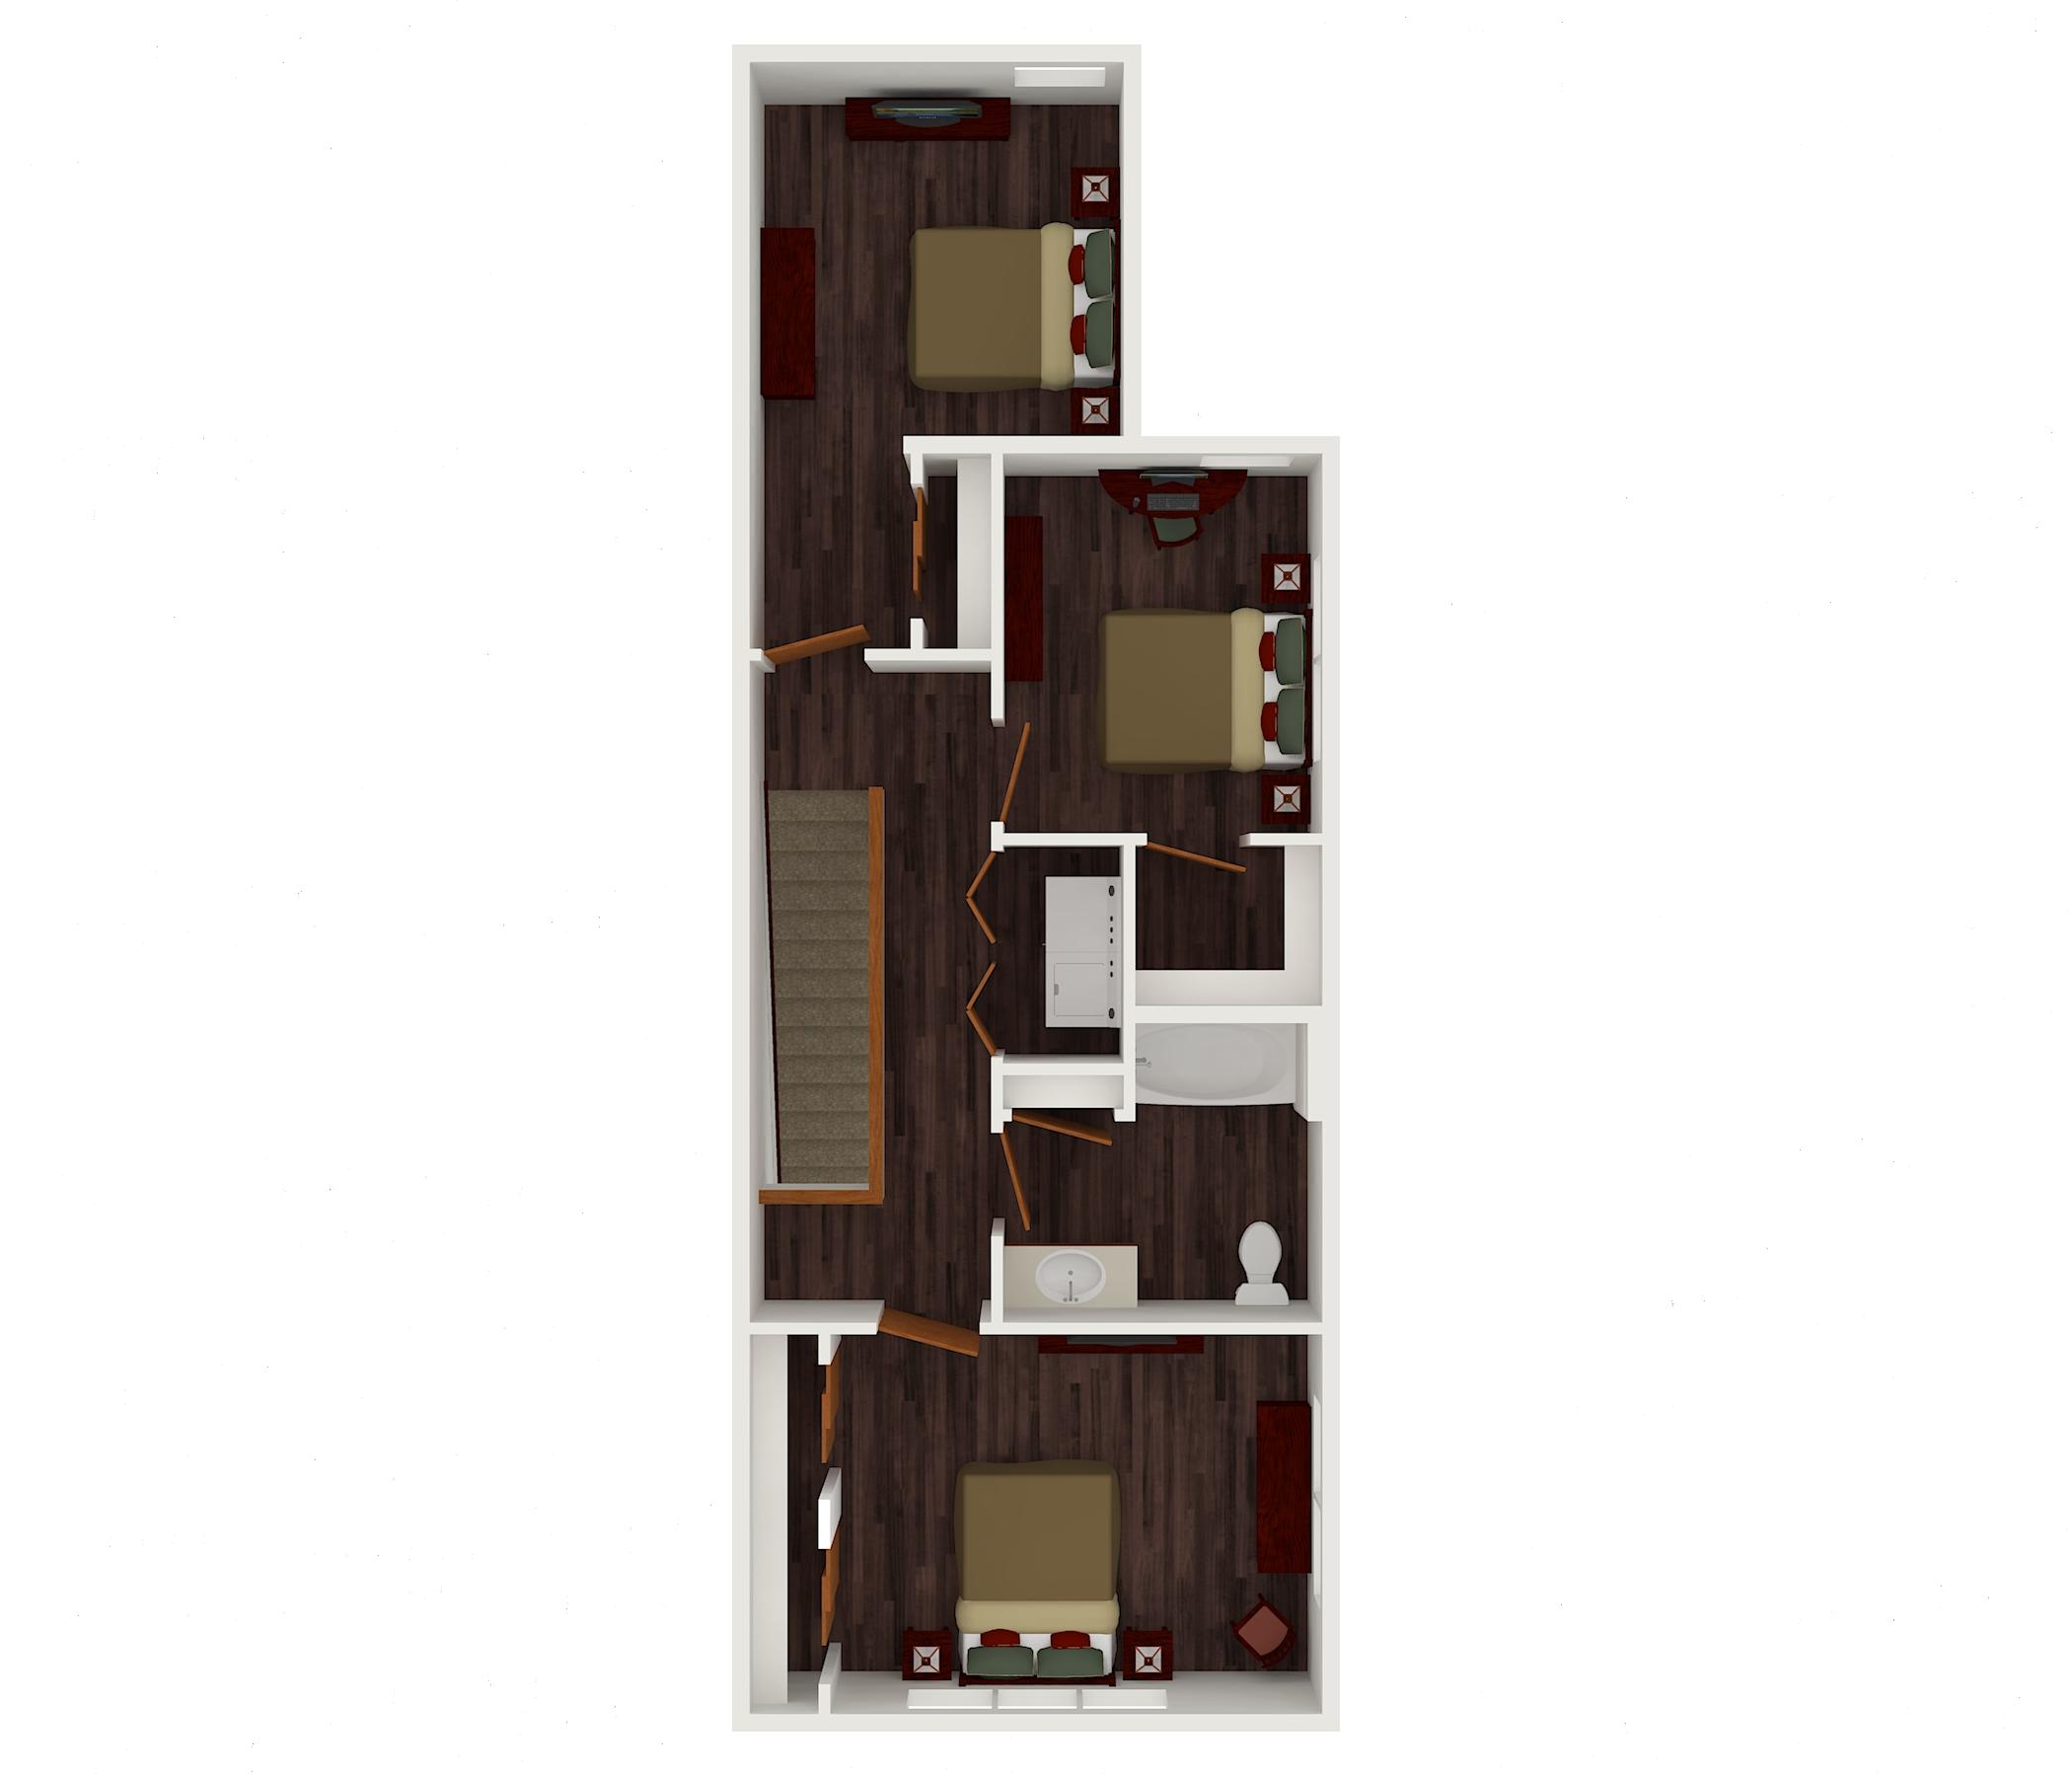 3 bed upper